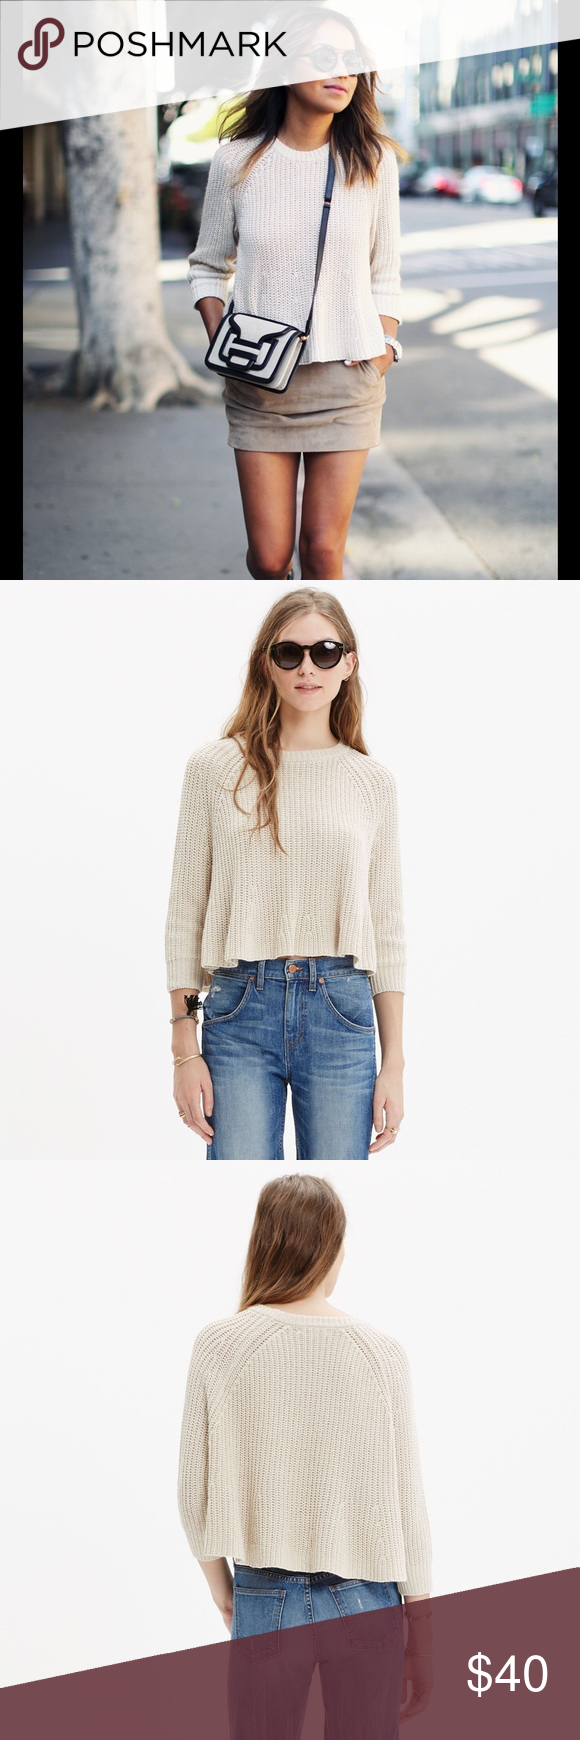 Madewell Tan Crop Swing Sweater SZ M | High rise jeans, Madewell ...